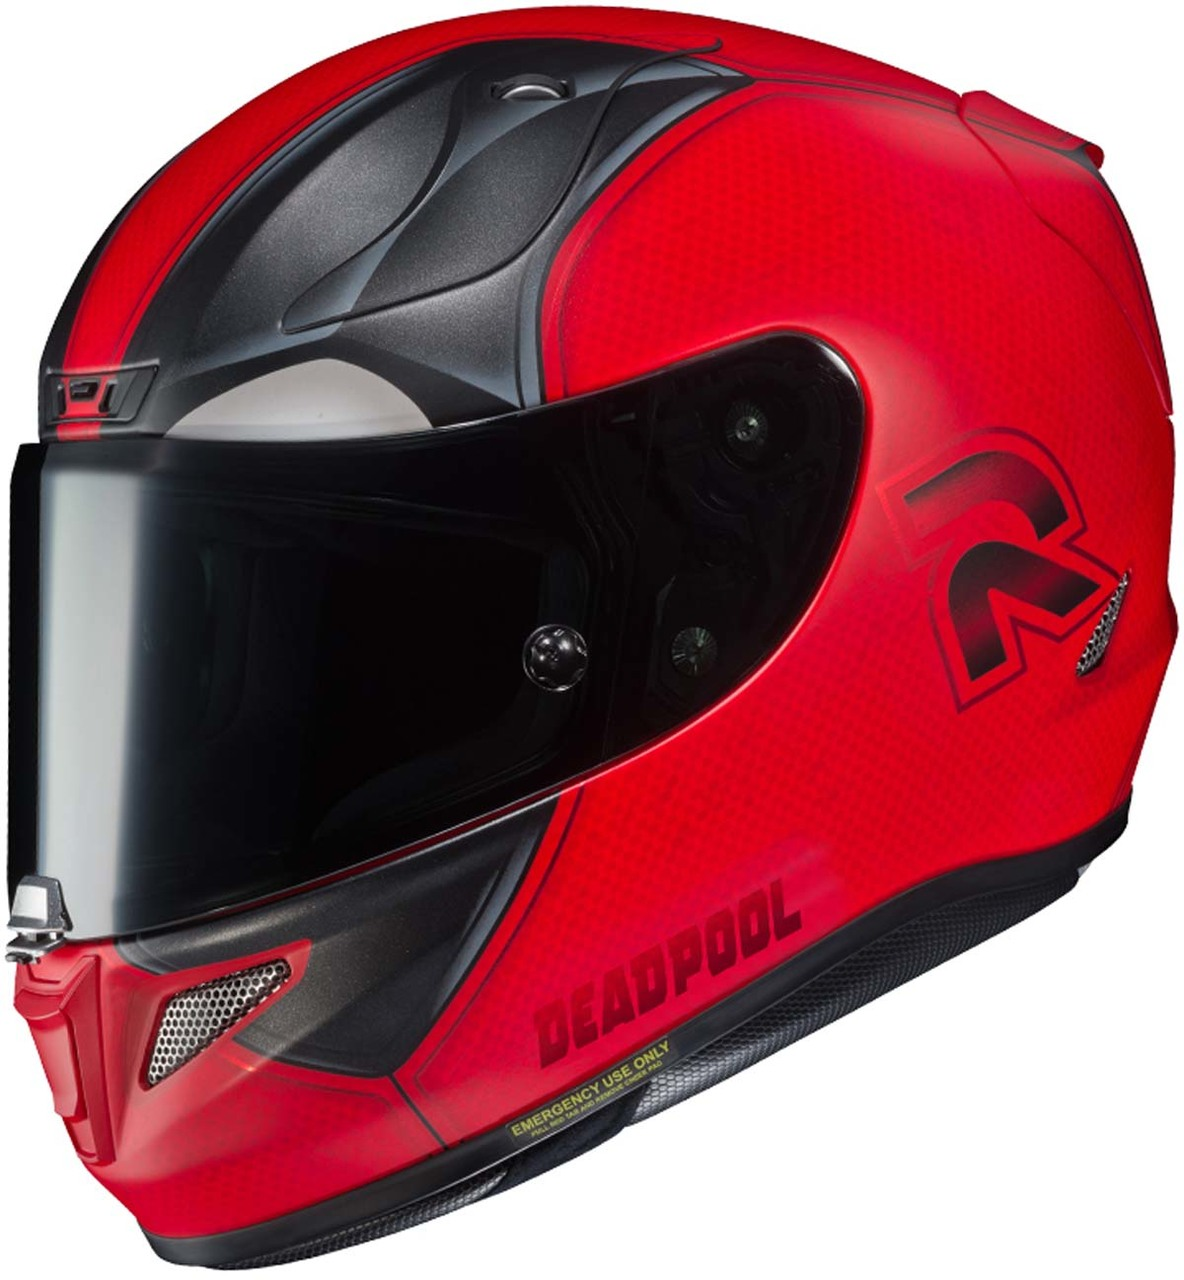 Hjc Rpha 11 >> Hjc Rpha 11 Pro Deadpool 2 Helmet Mc 1sf Xtremehelmets Com